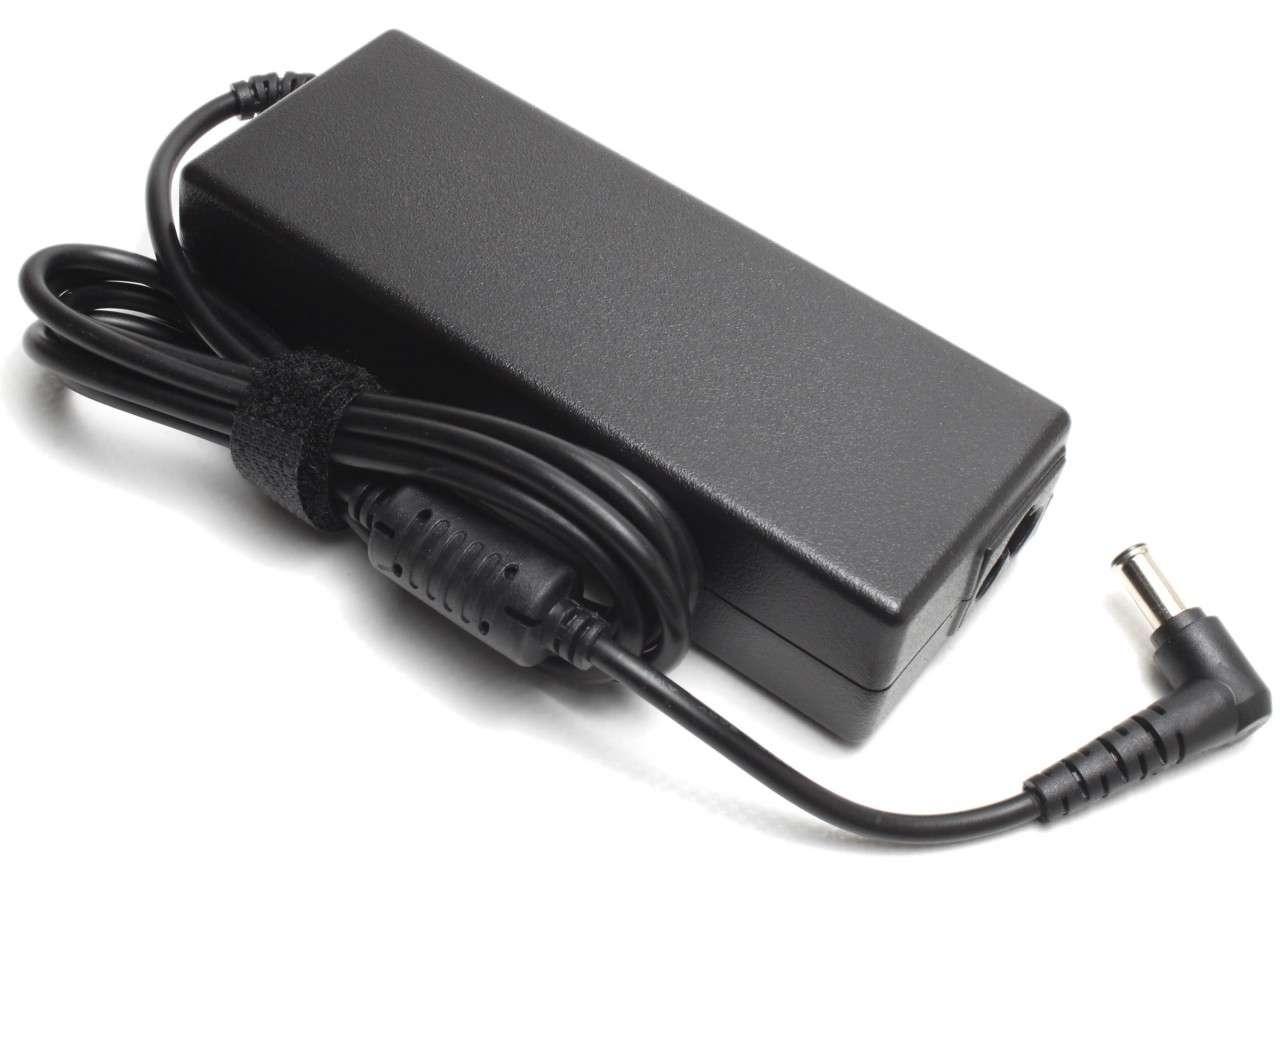 Incarcator Sony Vaio VGN C2S Replacement imagine powerlaptop.ro 2021